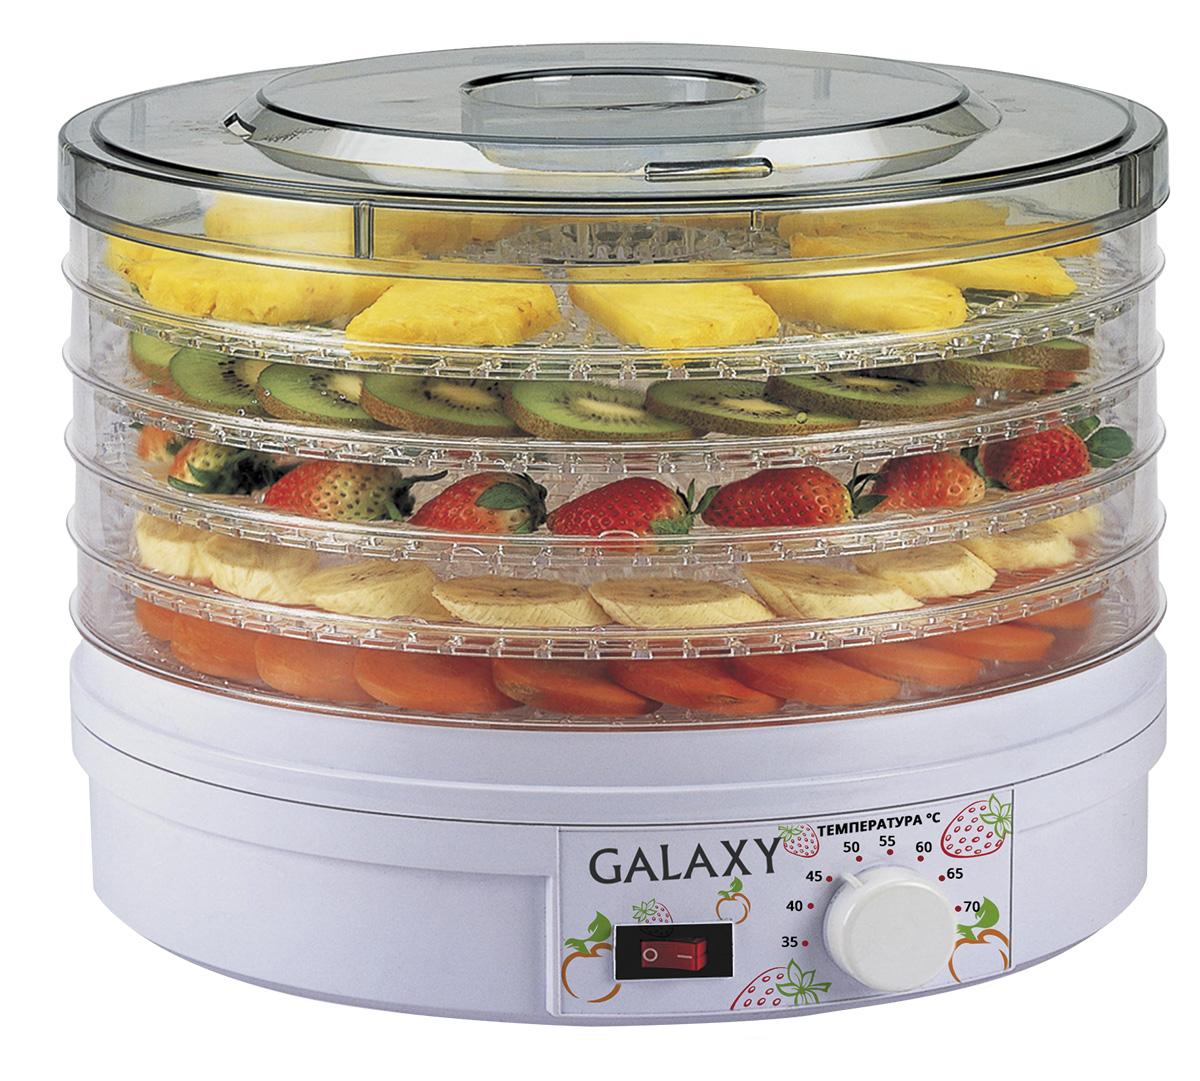 Galaxy GL2633 сушилка для овощей и фруктов - Техника для хранения, консервации и заготовок